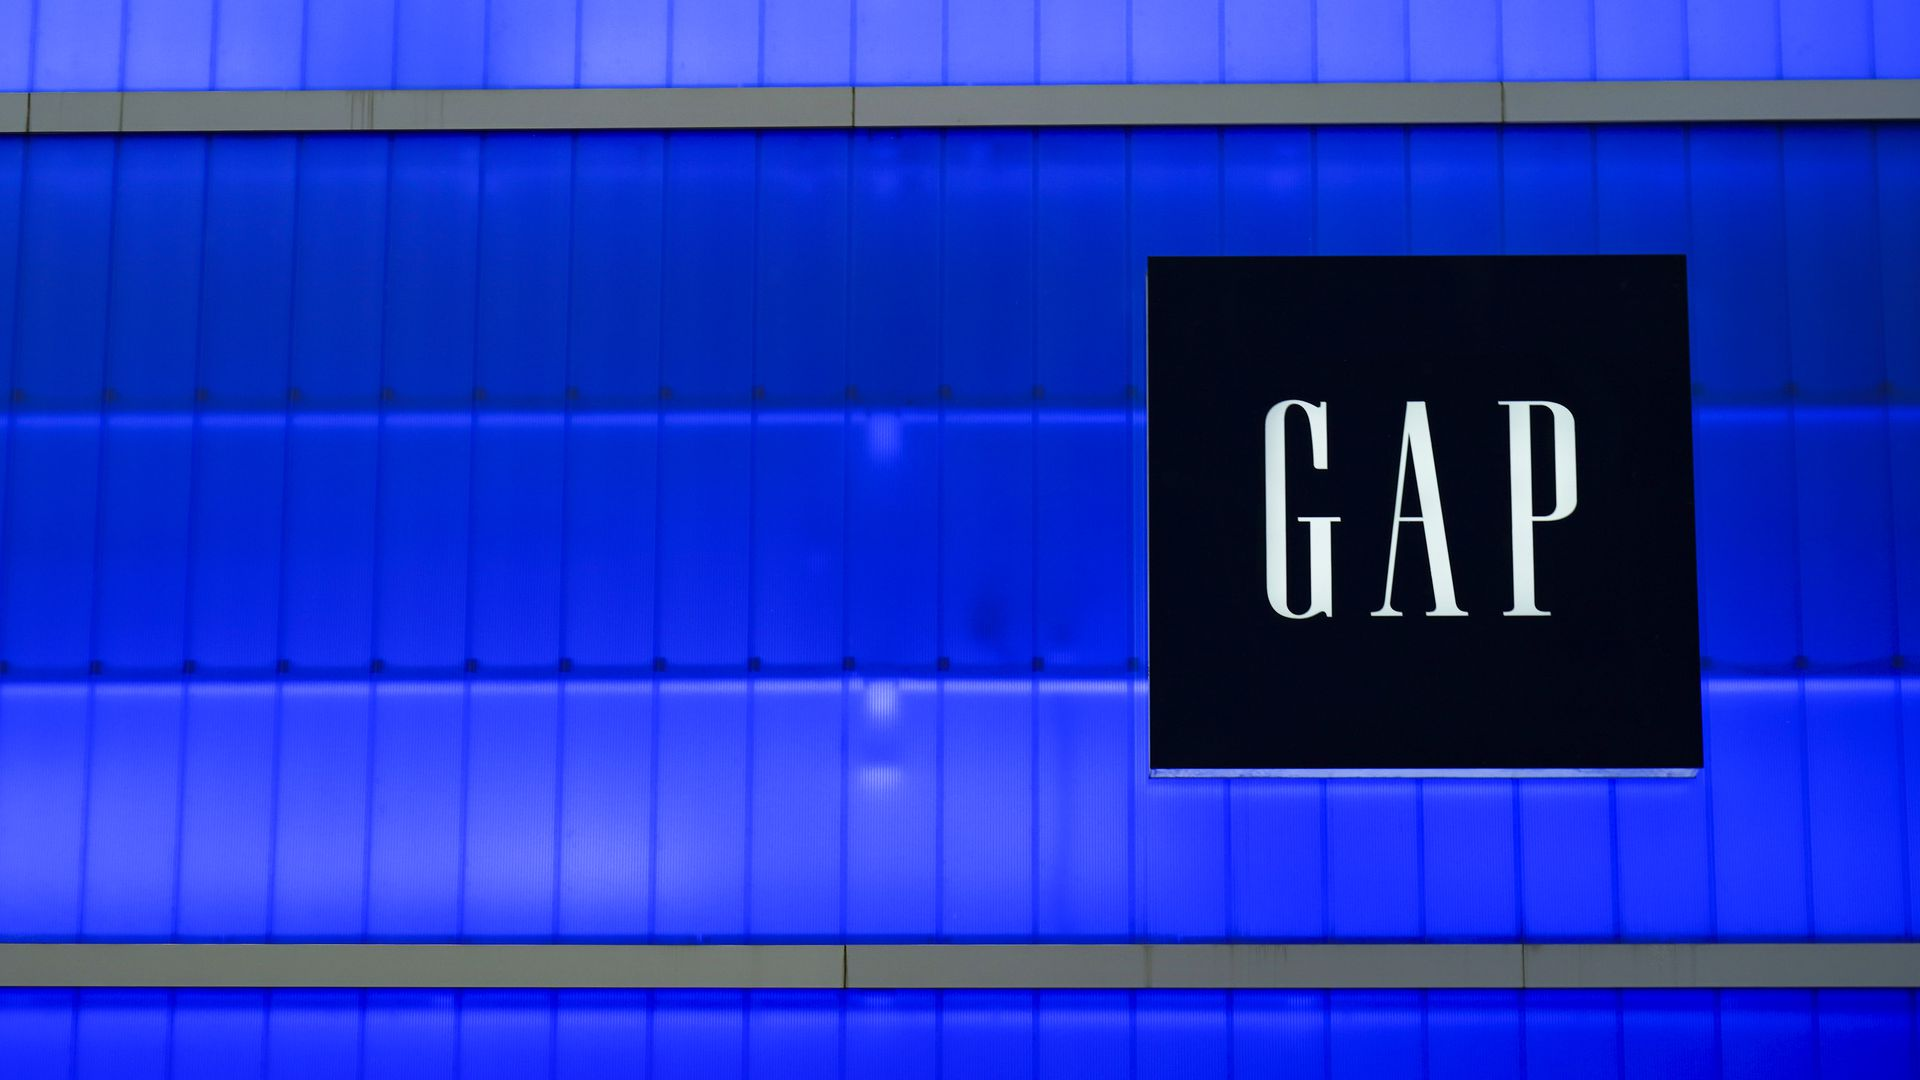 The GAP logo.